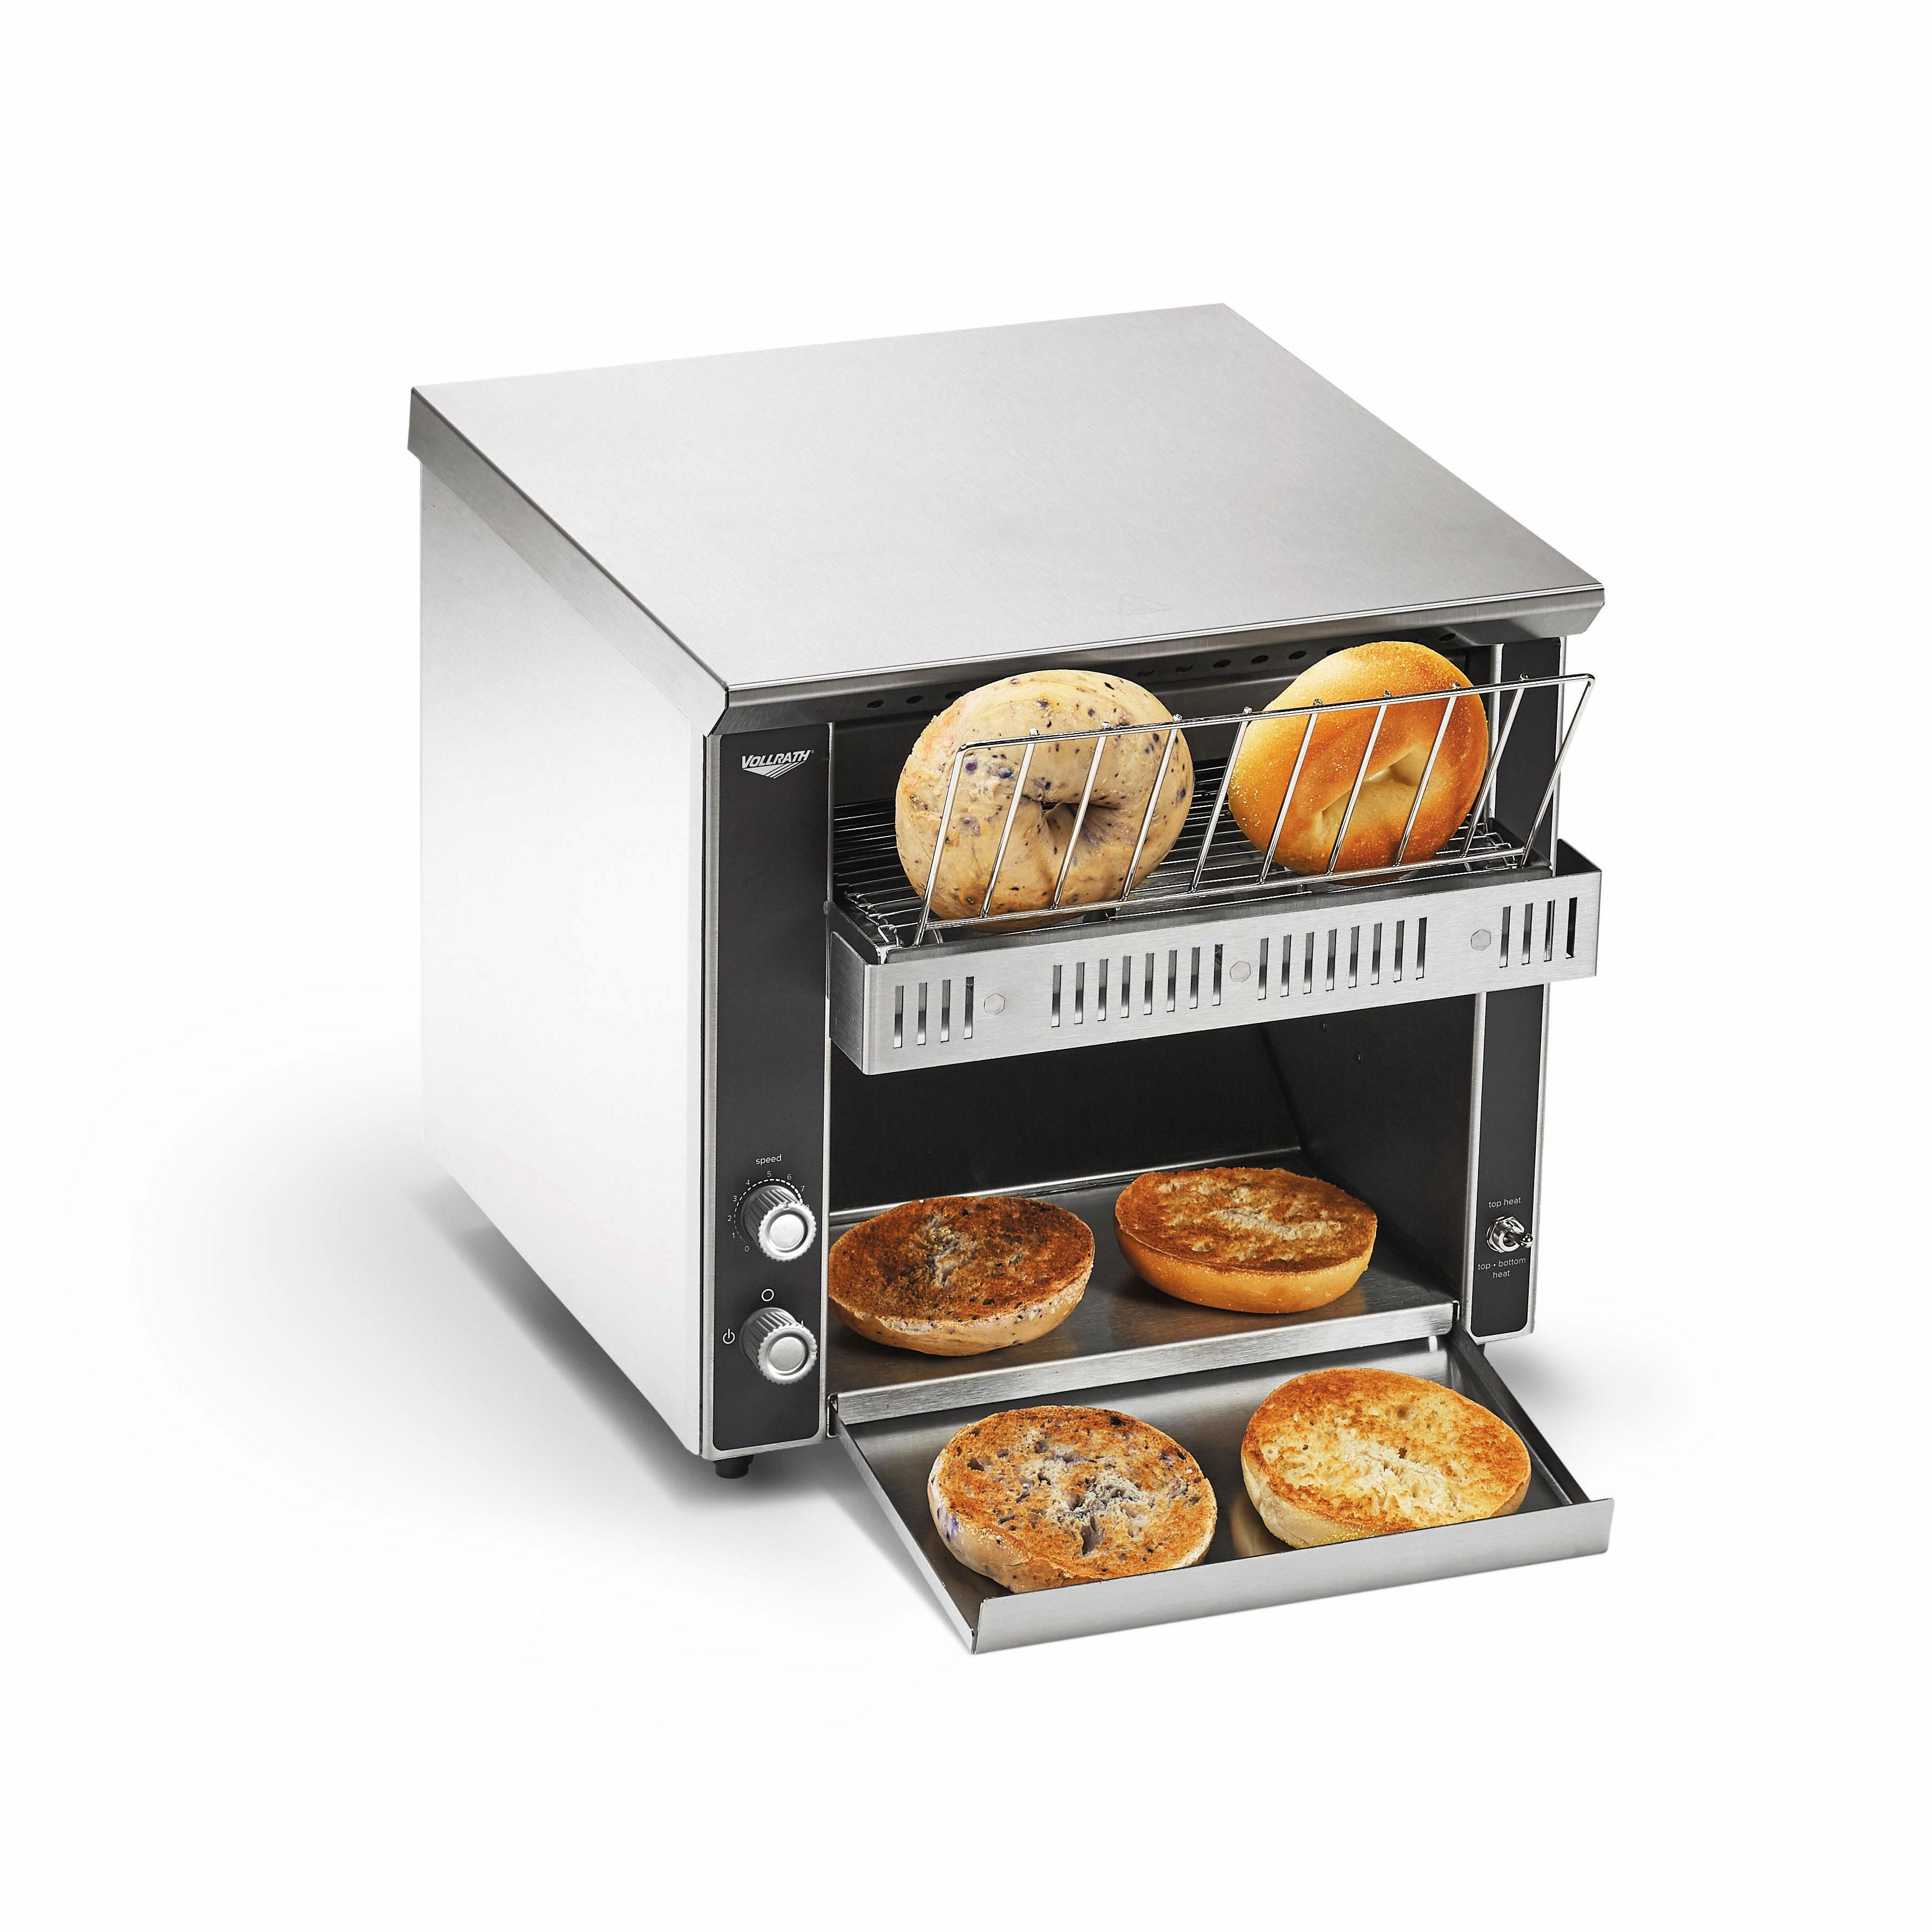 Vollrath CT2BH-120400 toaster, conveyor type